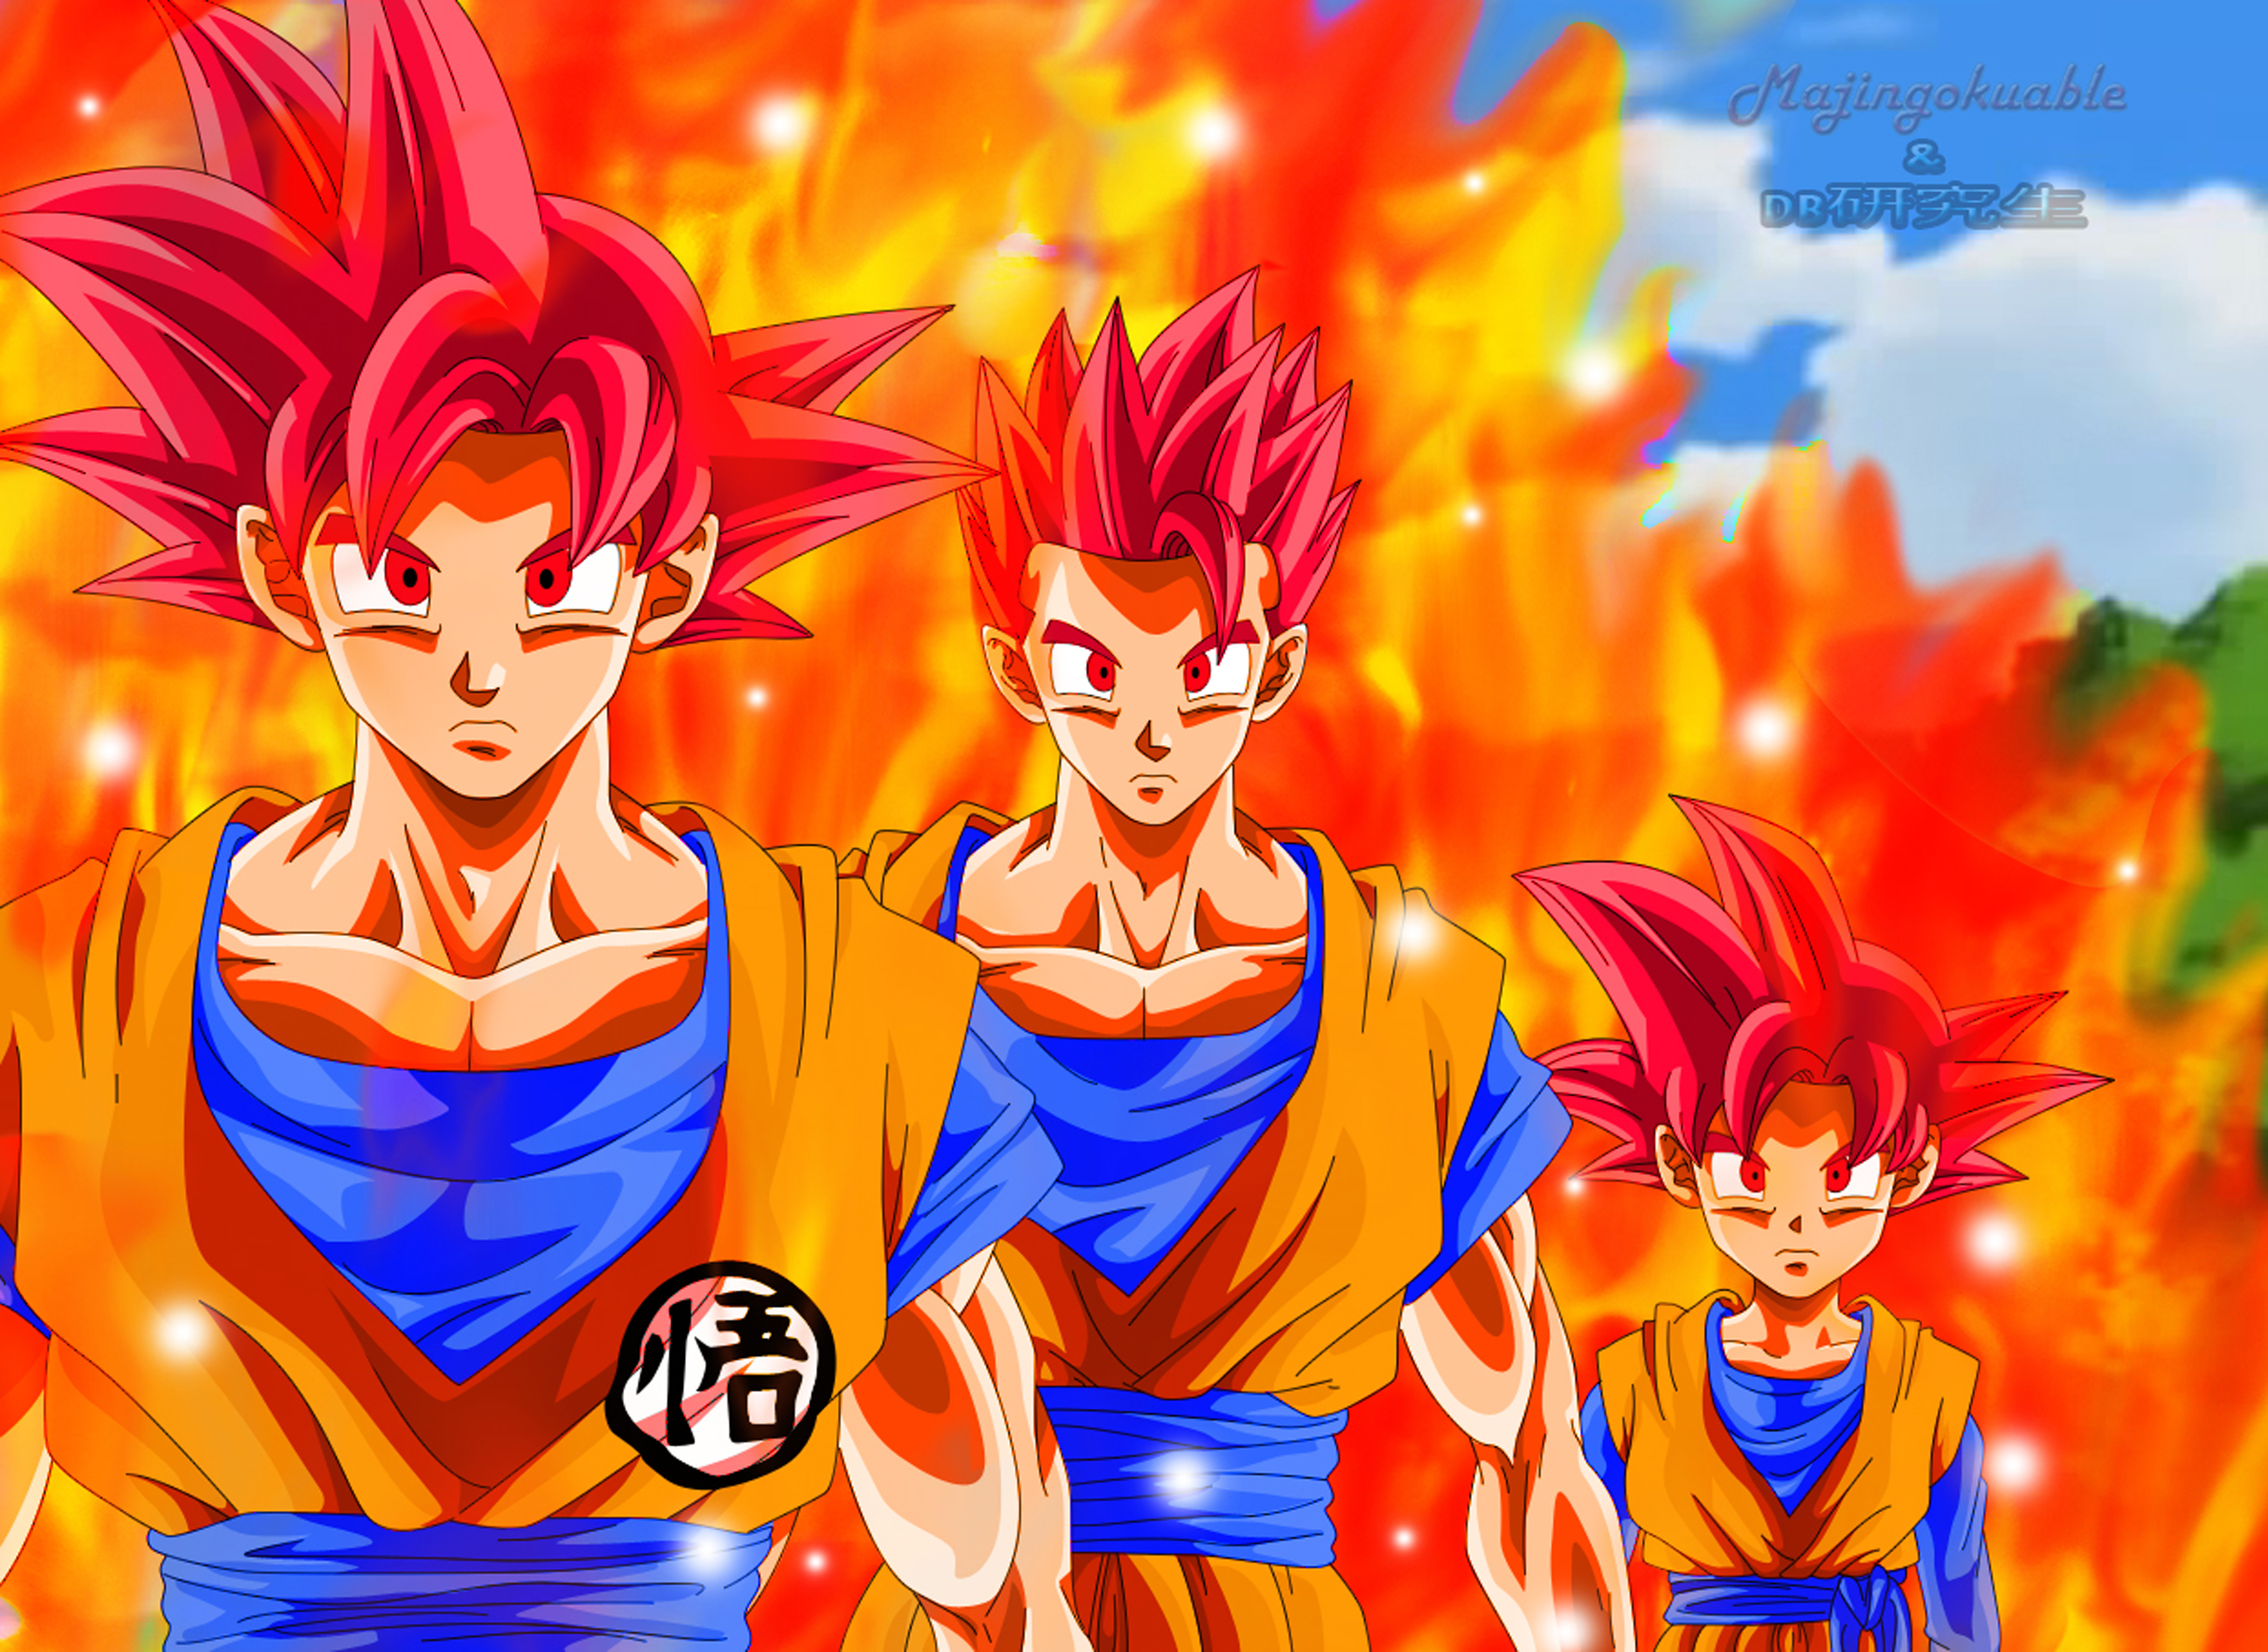 Goku vs teen gohan but have